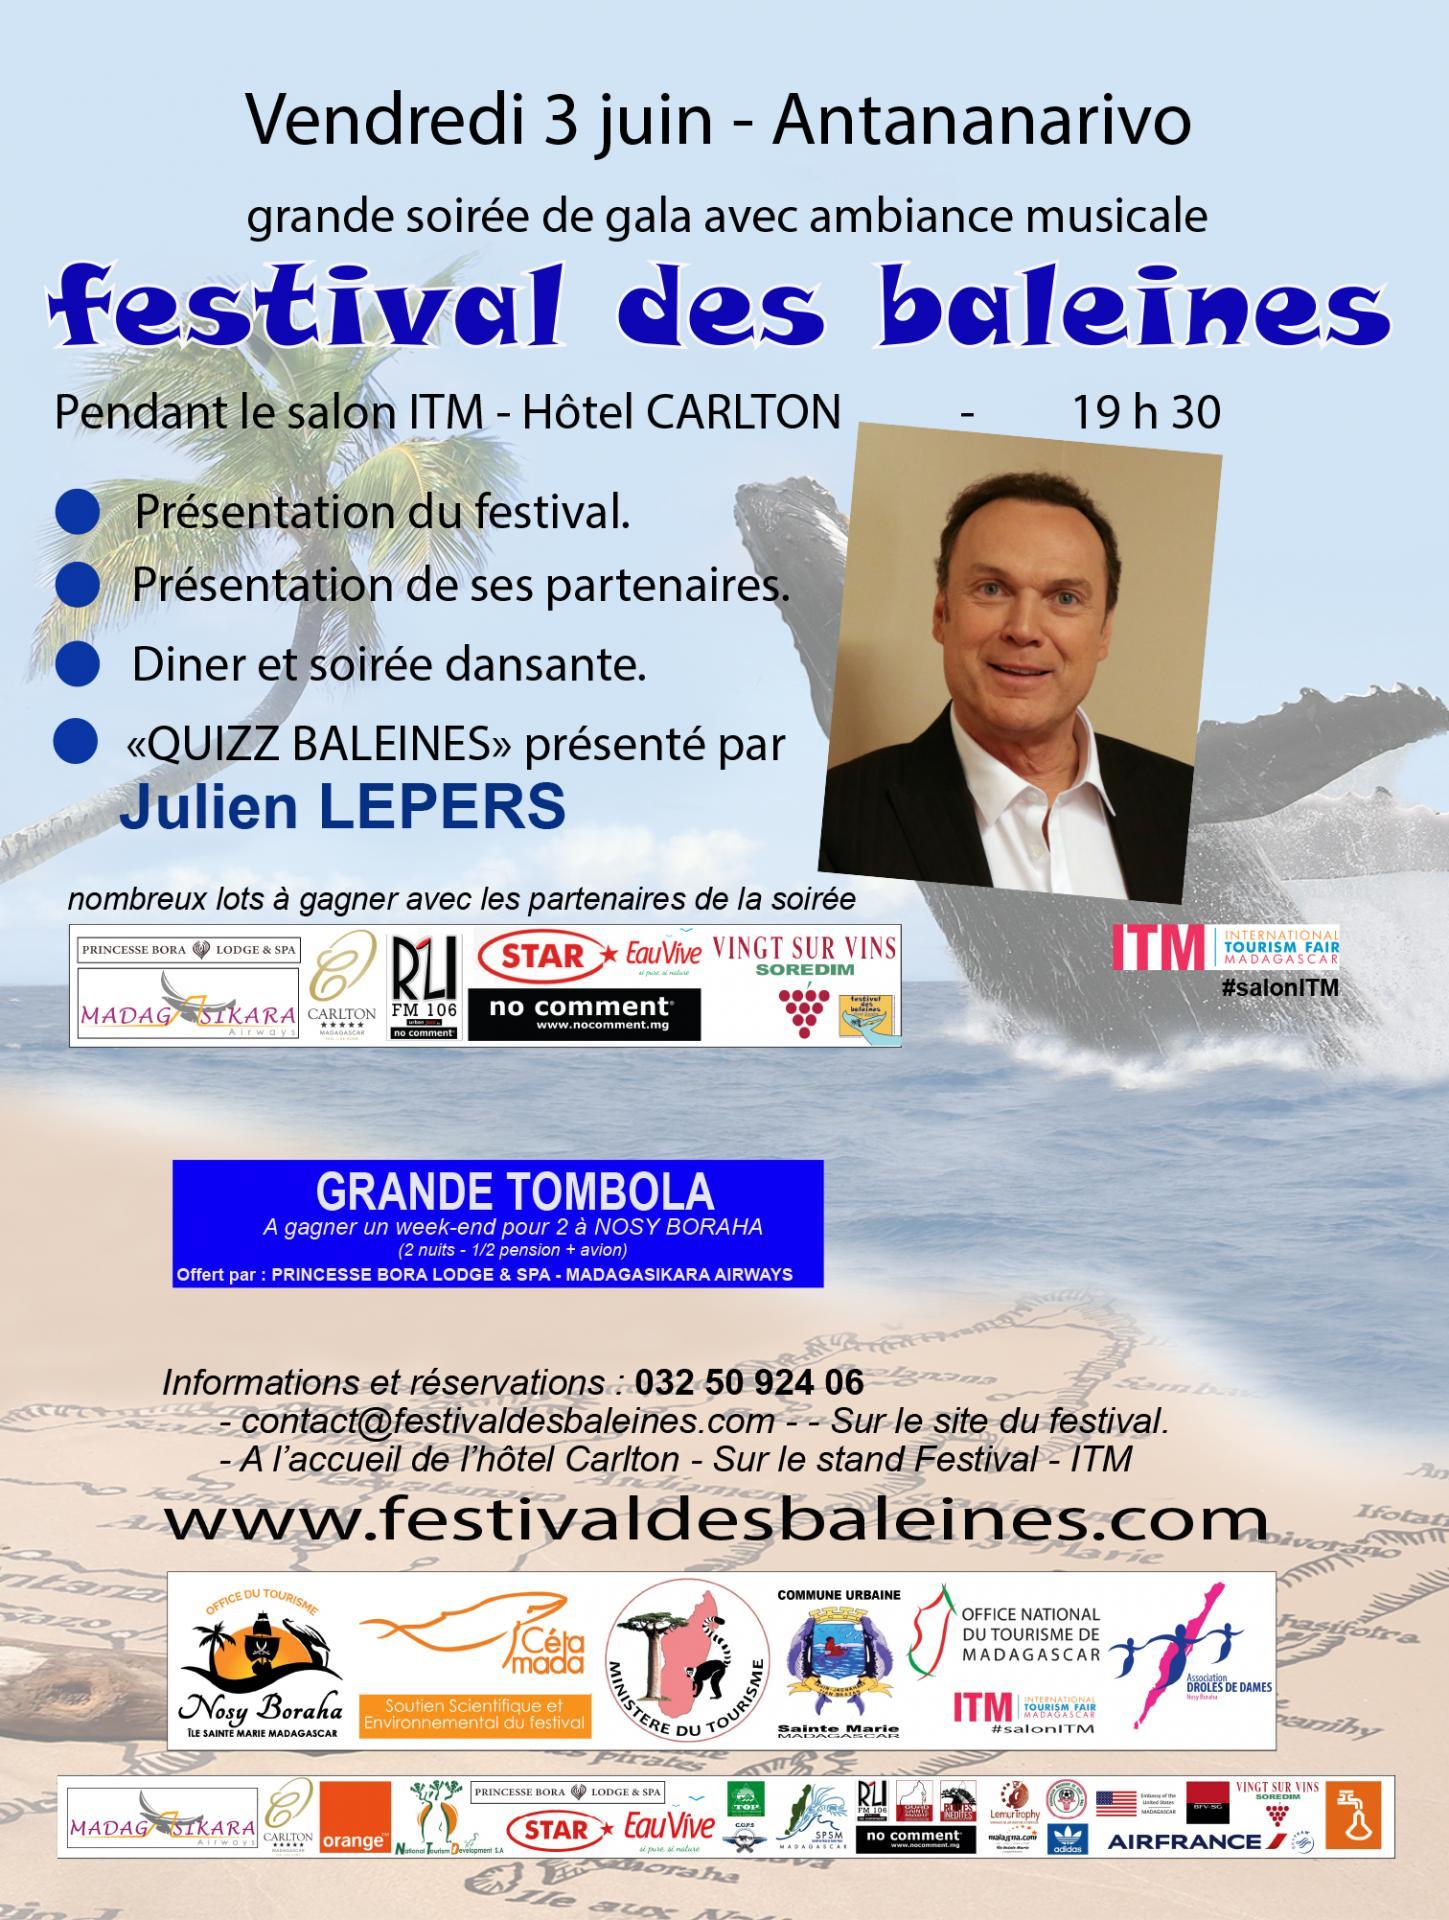 Soiree gala festival des baleines 2016